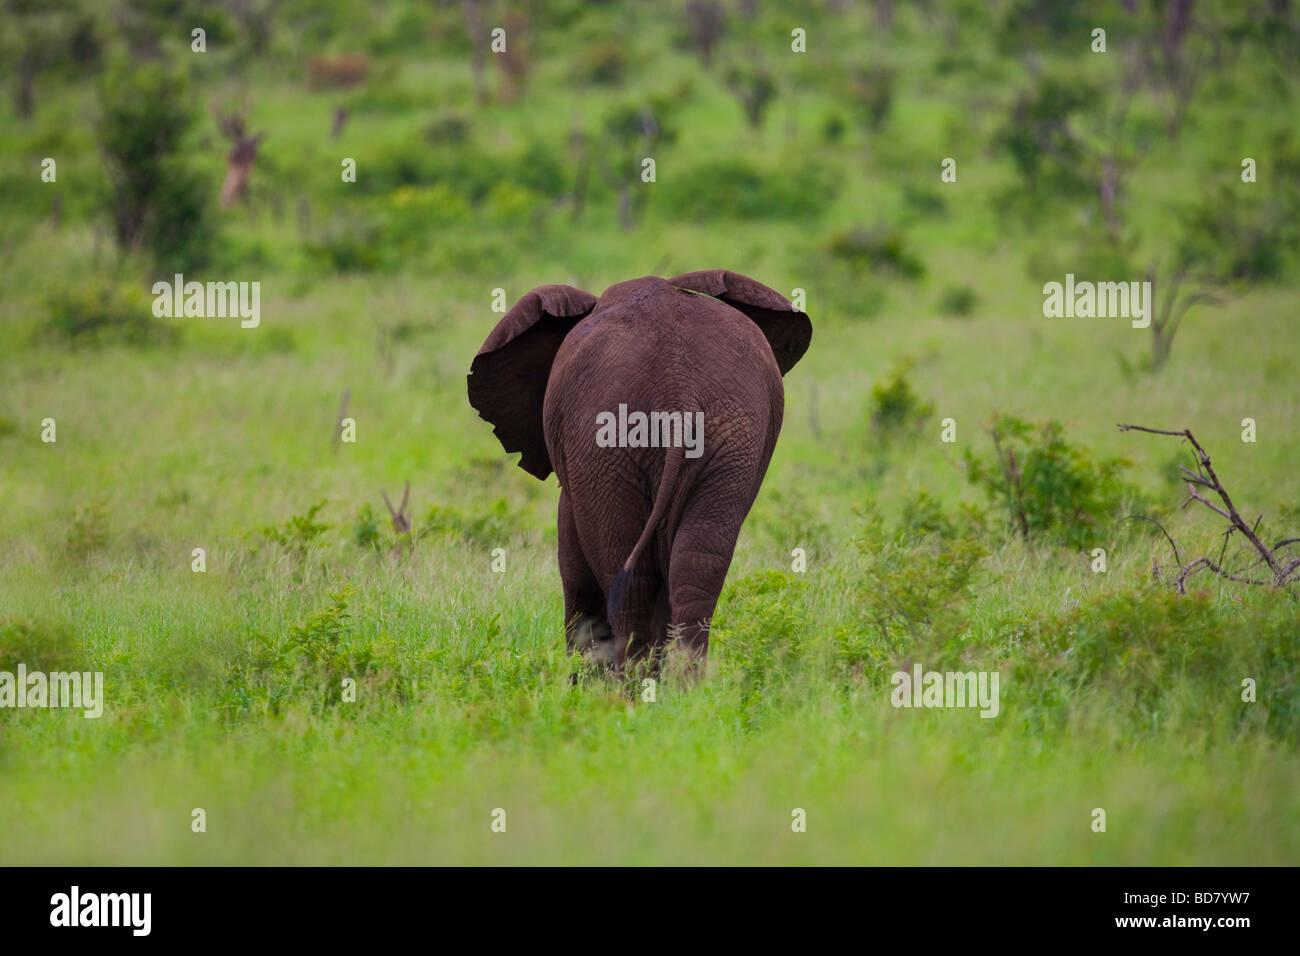 El elefante Loxodonta Africana Kruger NP Sudáfrica Imagen De Stock